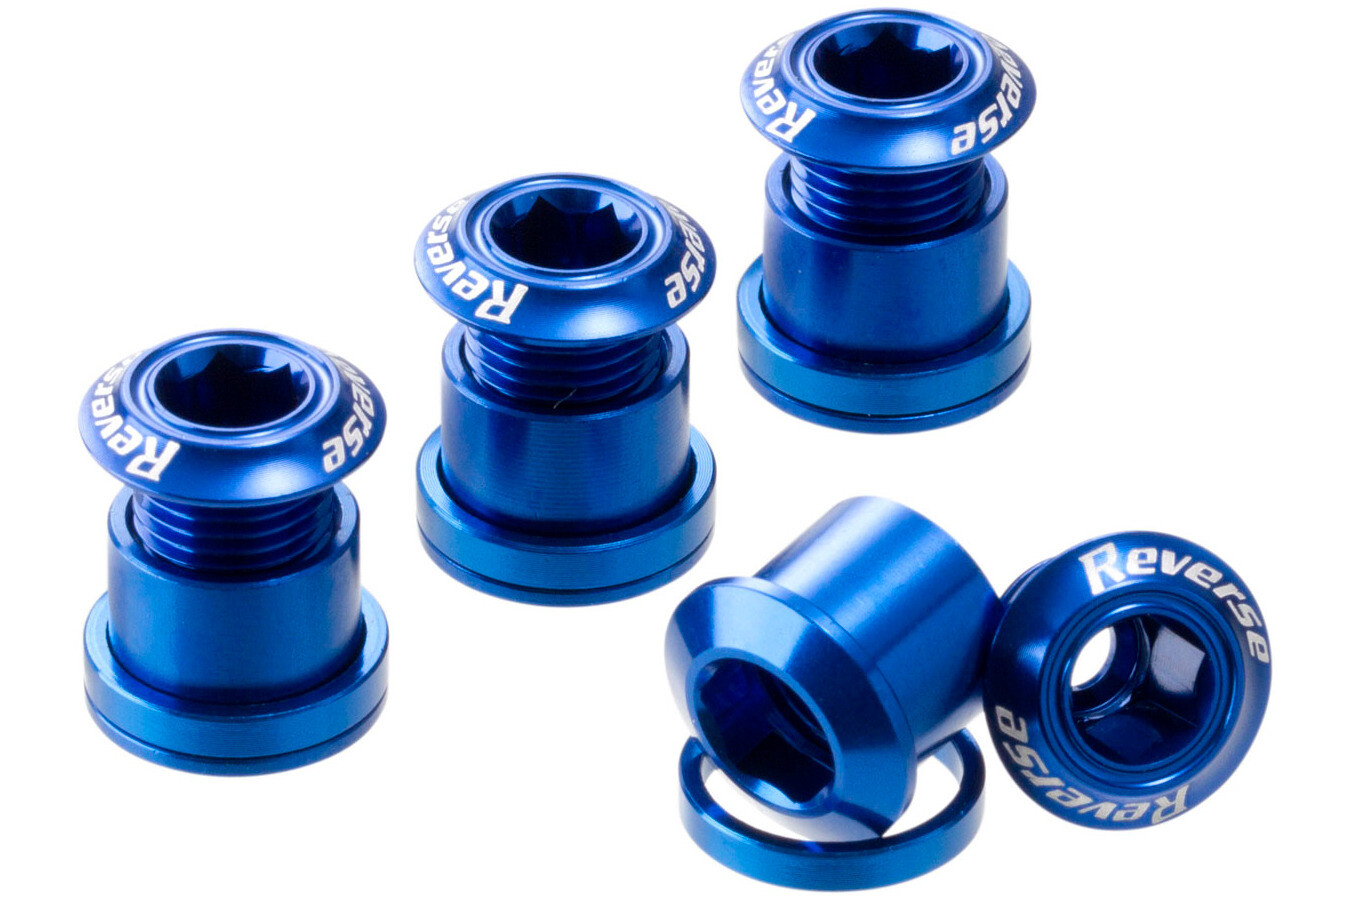 Reverse Klingebolte, dark blue | Klingebolte